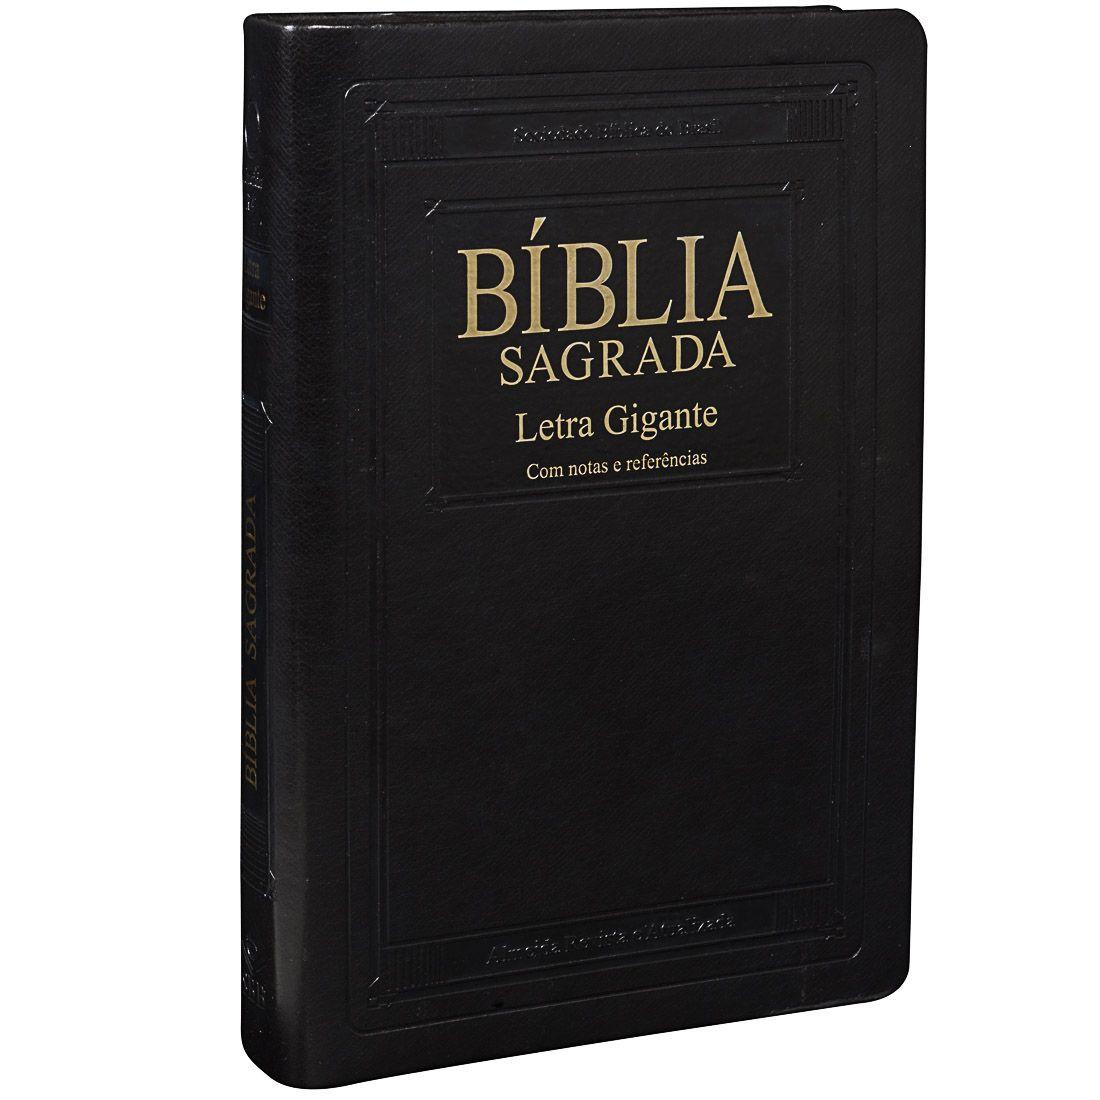 Bíblia Sagrada Letra Gigante / Preto - (ARA)  - Universo Bíblico Rs